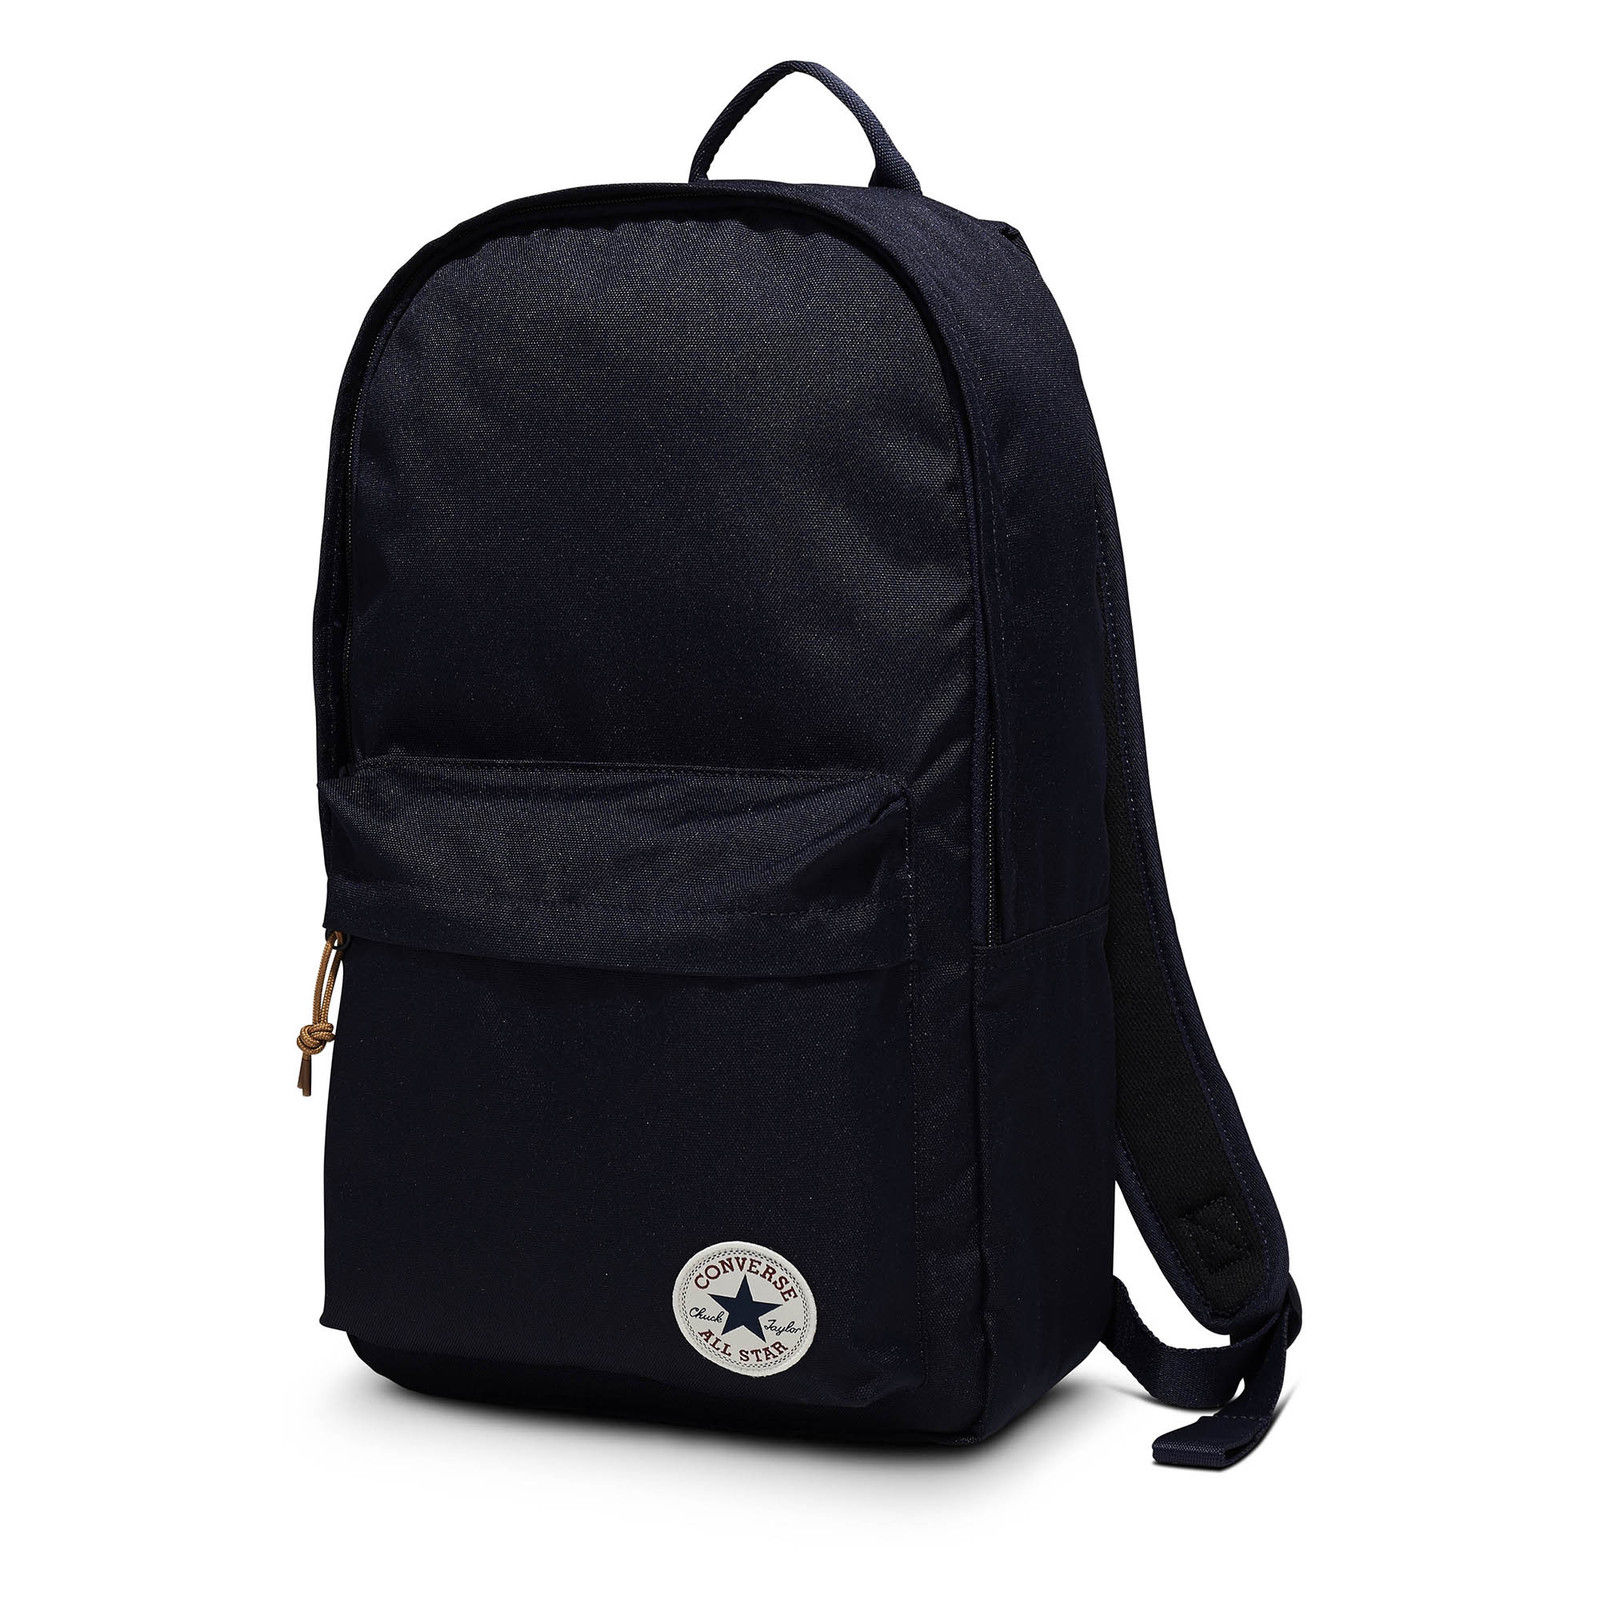 b5bd622a9b38 CONVERSE NEW EDC Poly Backpack Midnight Indigo BNWT 888754837550